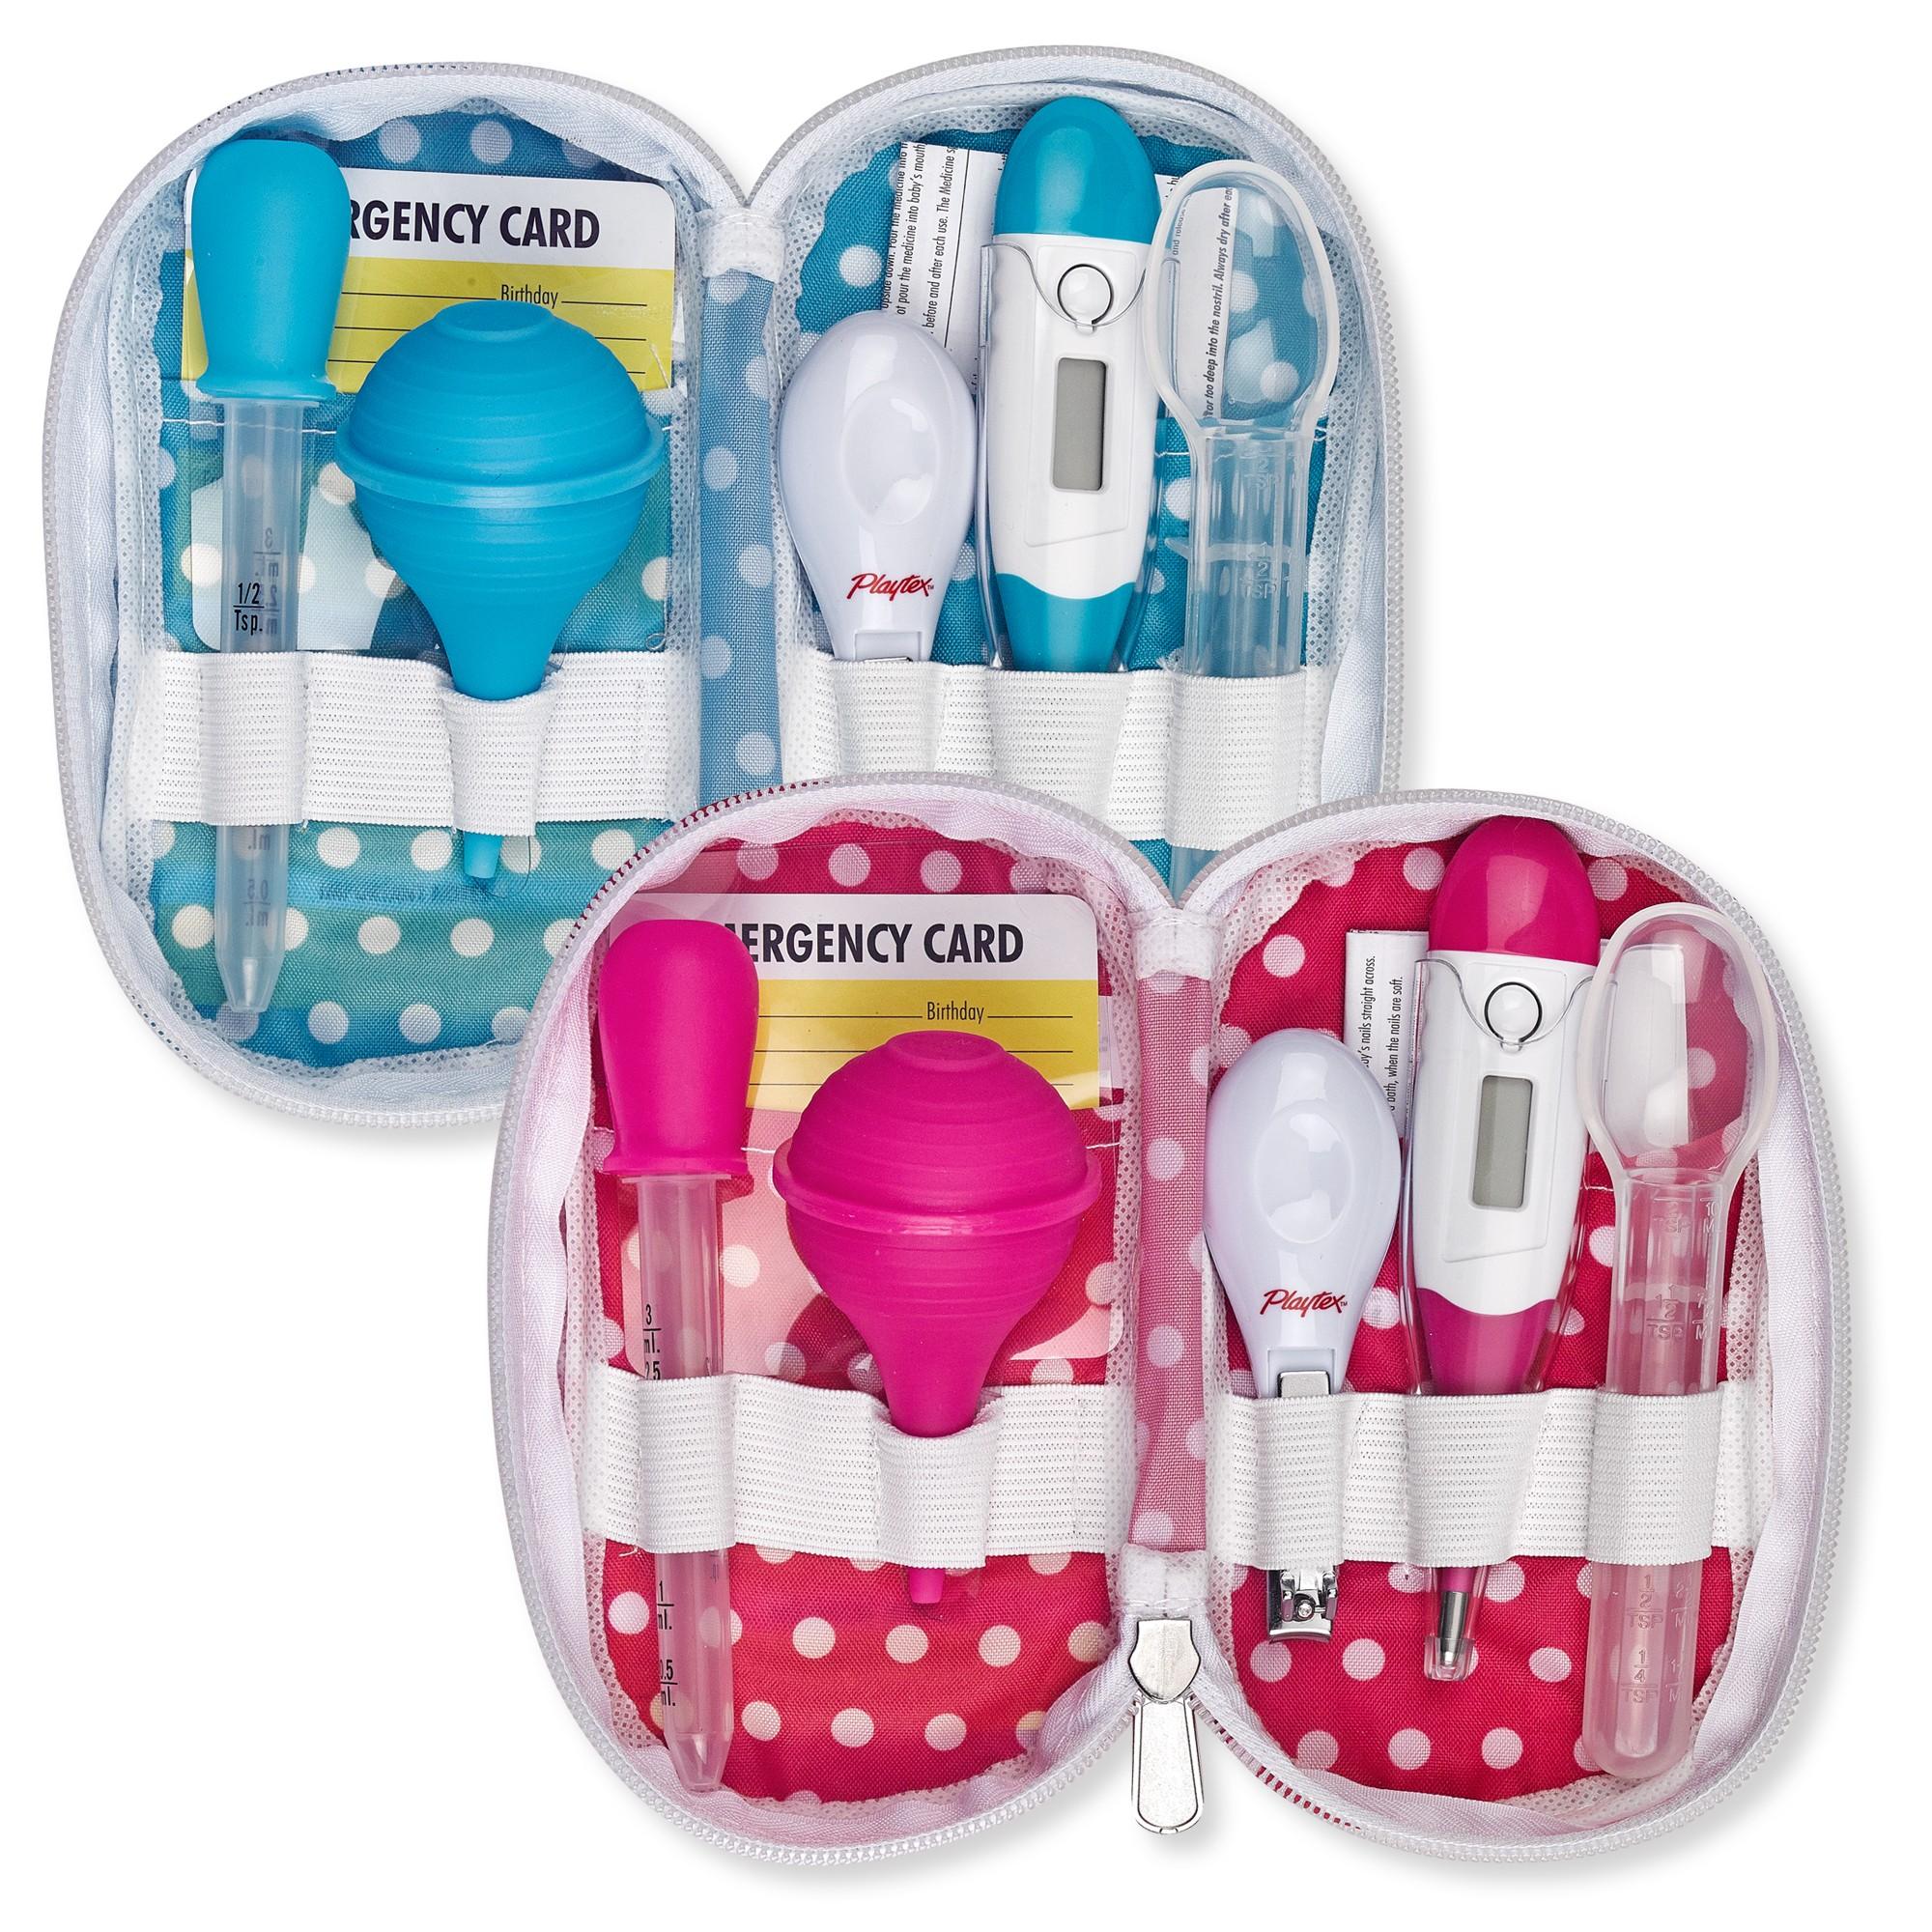 6 pc. Healthcare Kit